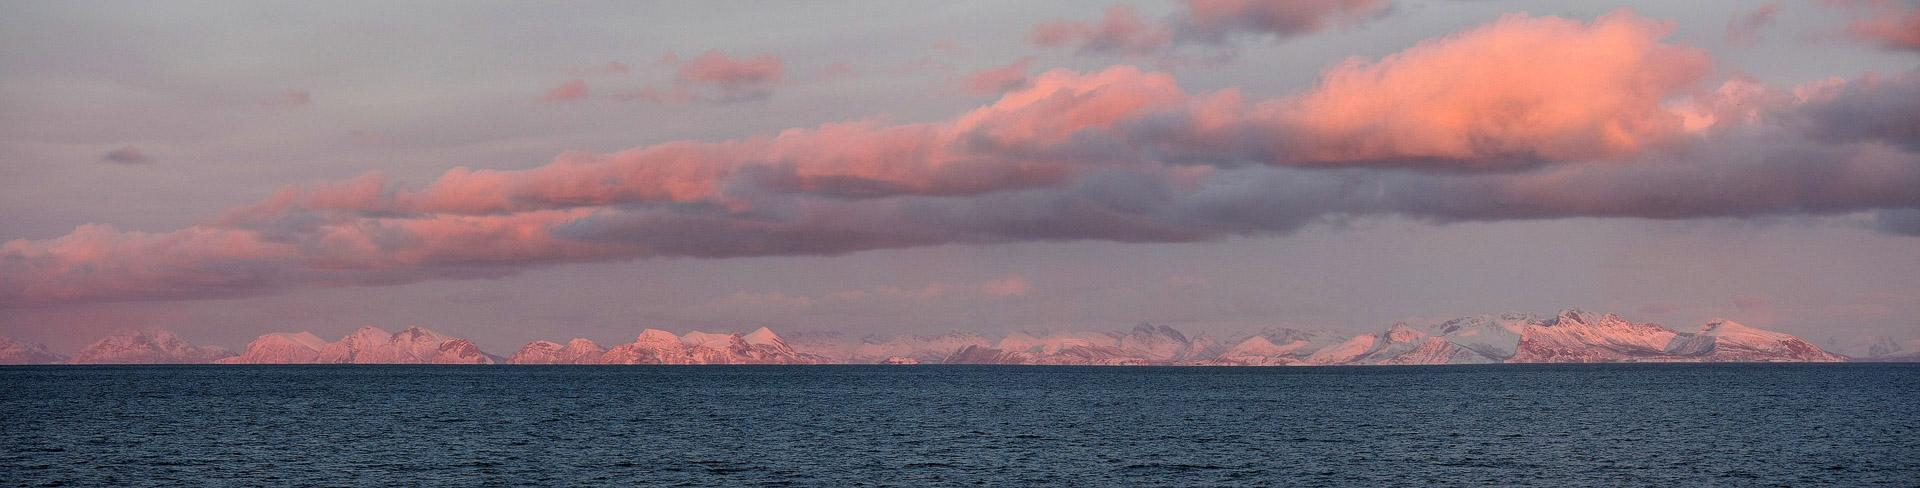 Sonnenuntergang im Vestfjord vor den Lofoten